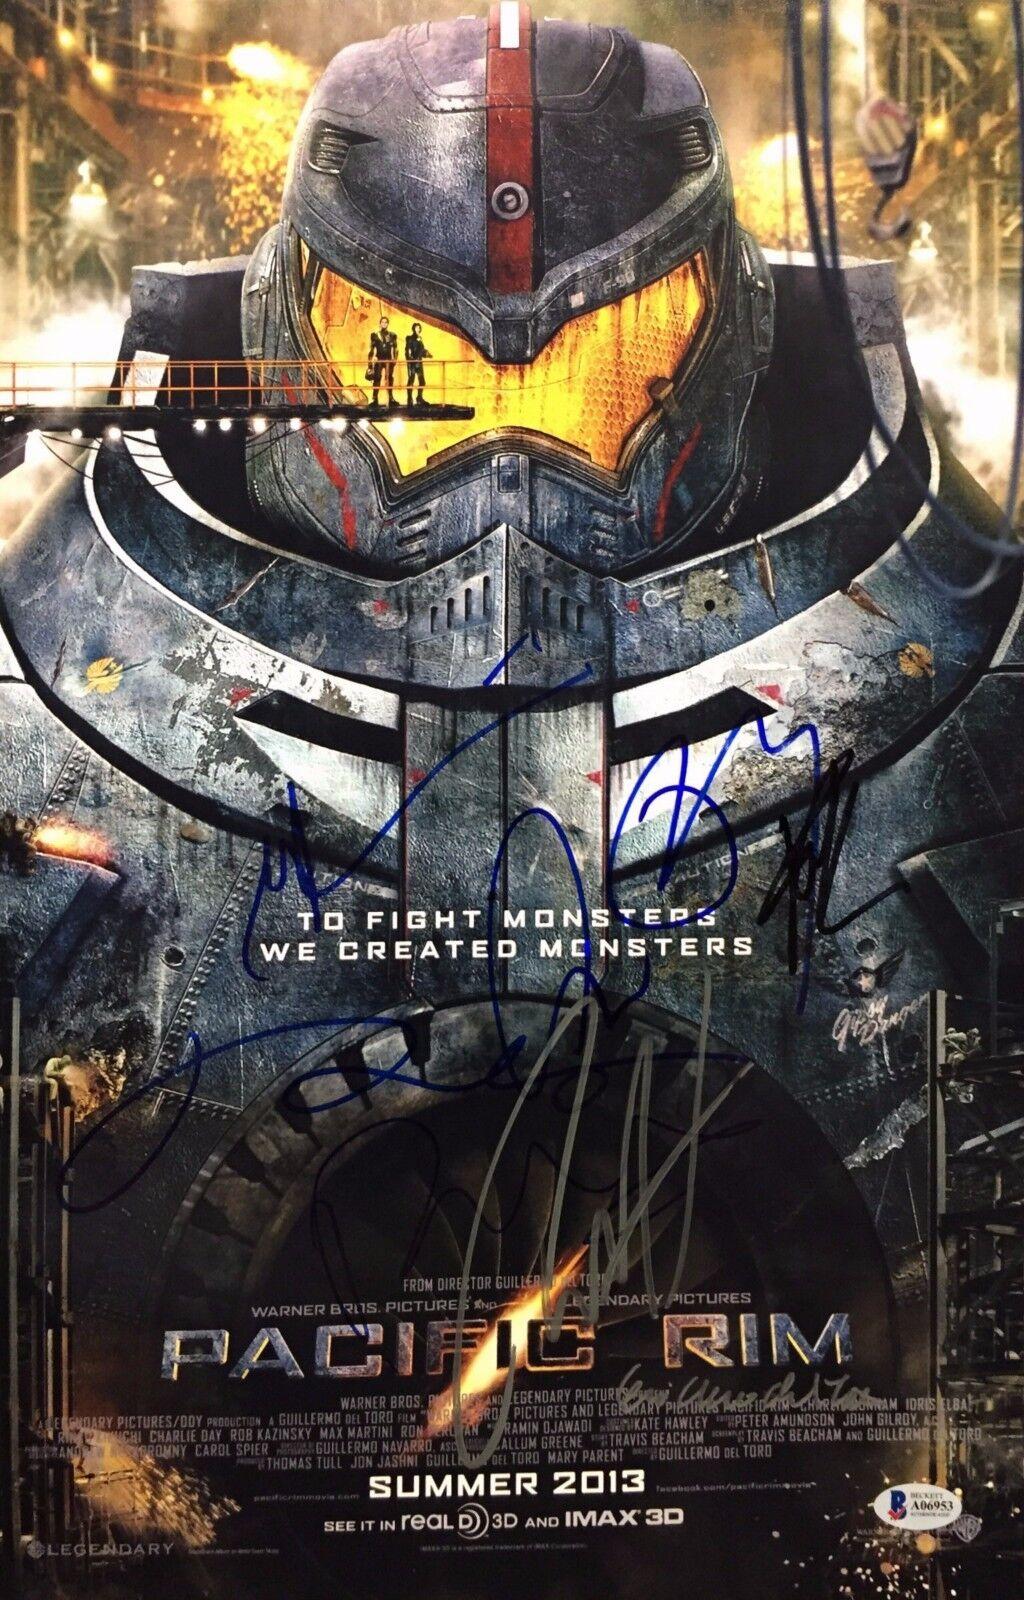 C Hunnam/G Del Toro/Kikuchi/Charlie Day/+3 Signed Pacific Rim 12x18 Photo BAS